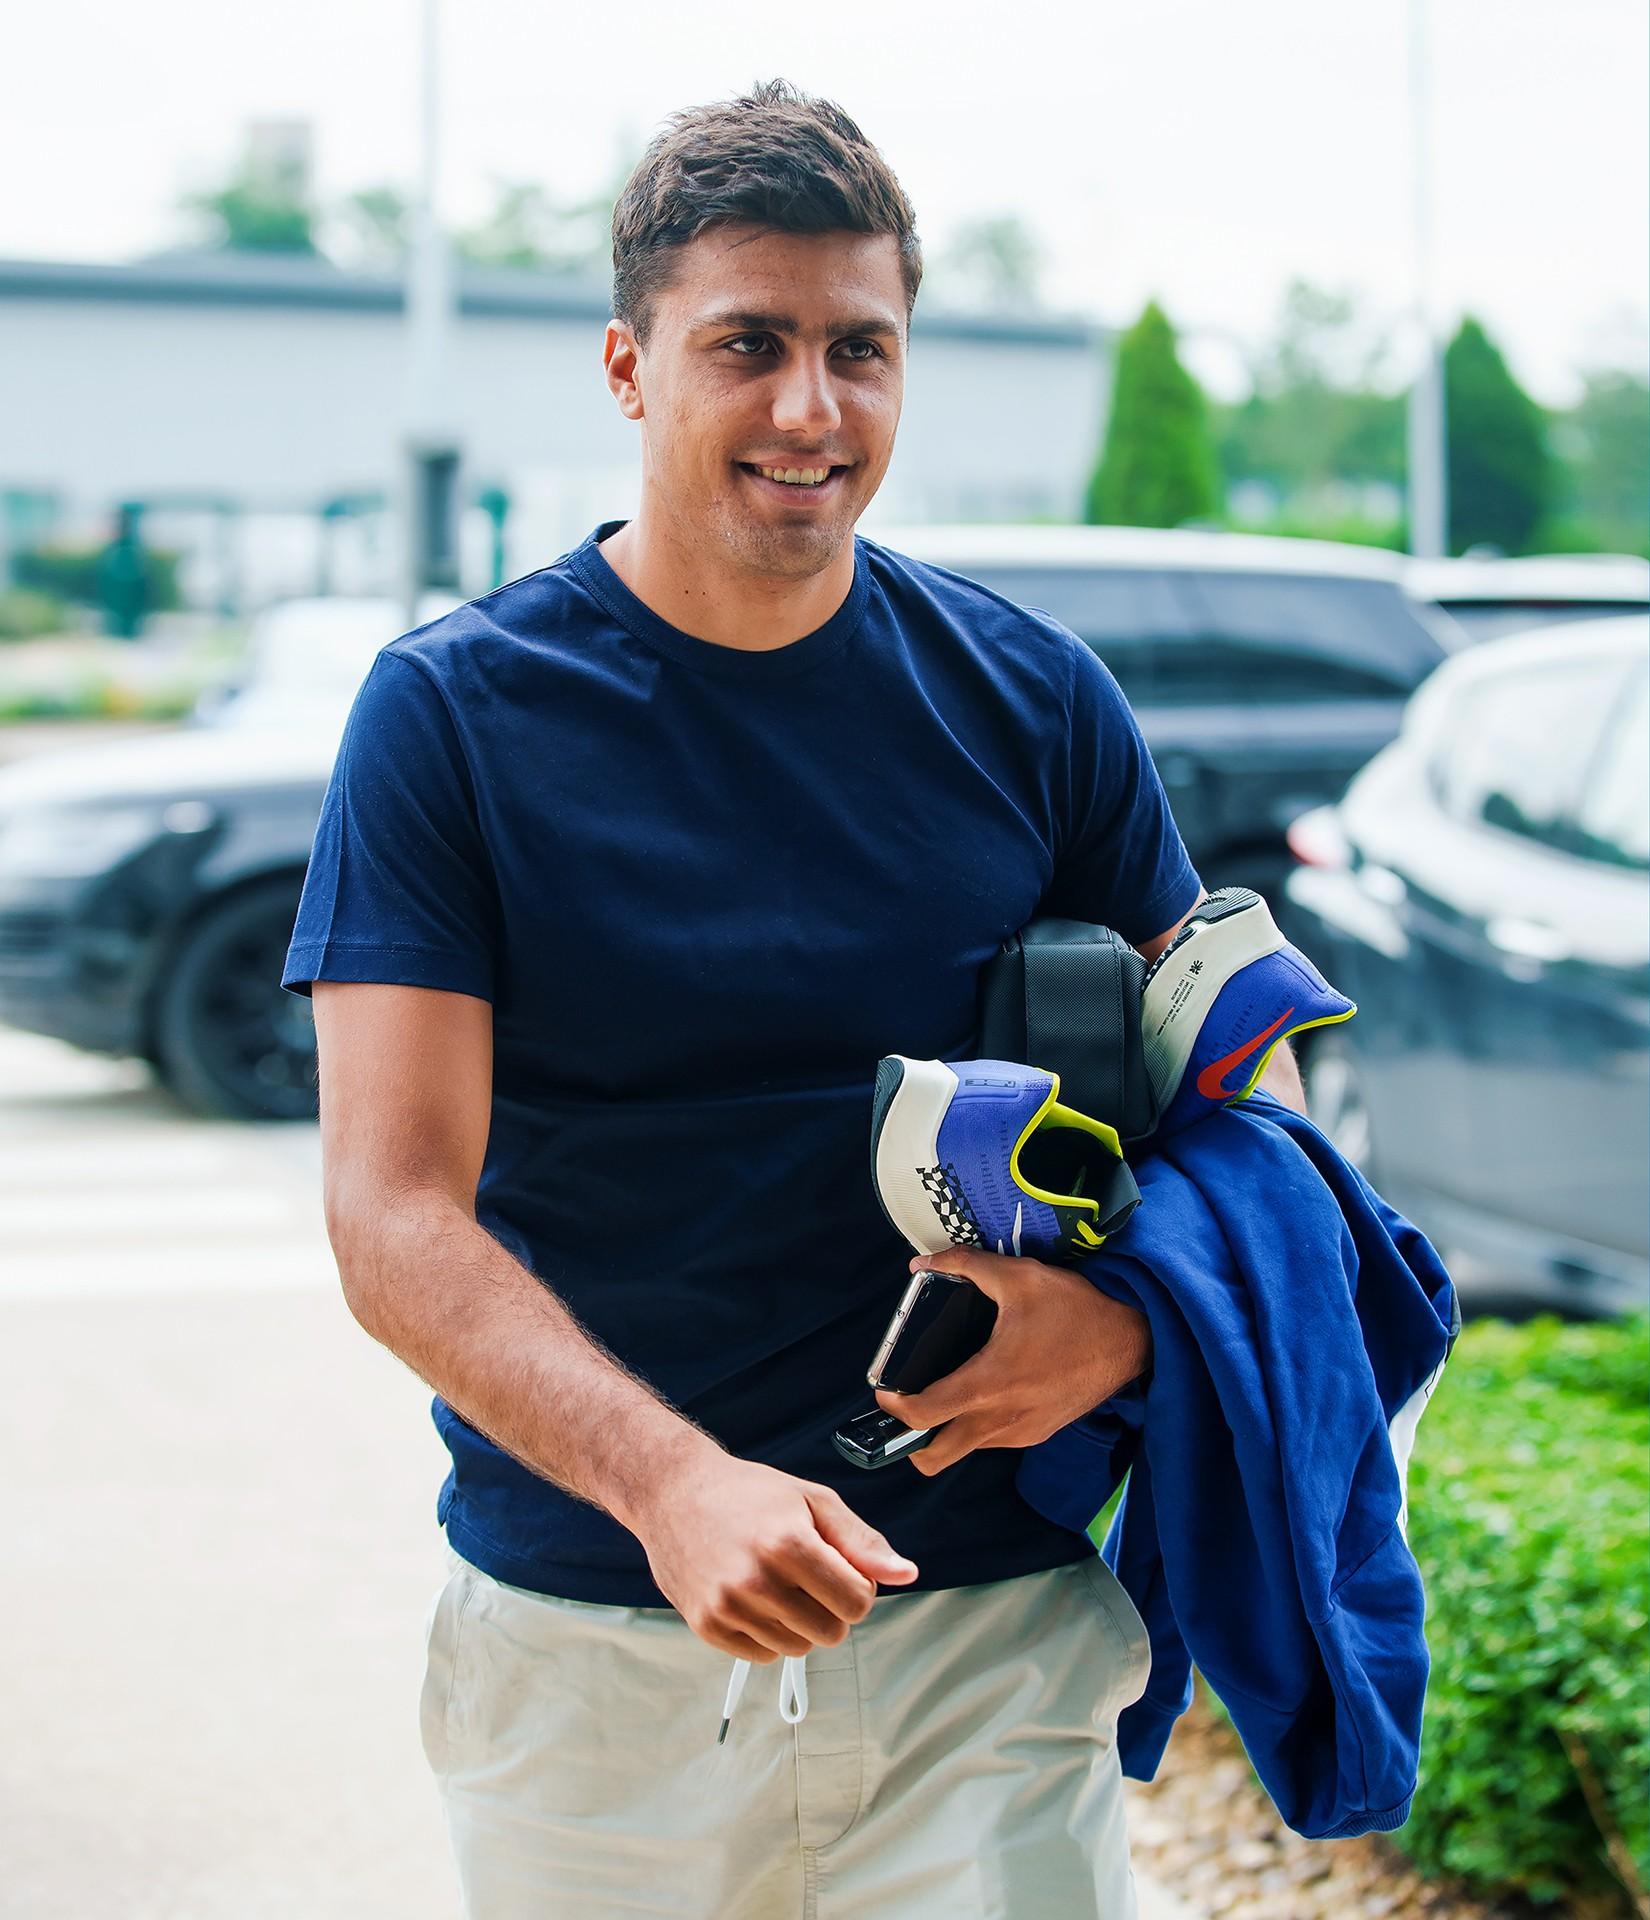 WELCOME BACK! Rodrigo arrives at the CFA on Monday morning